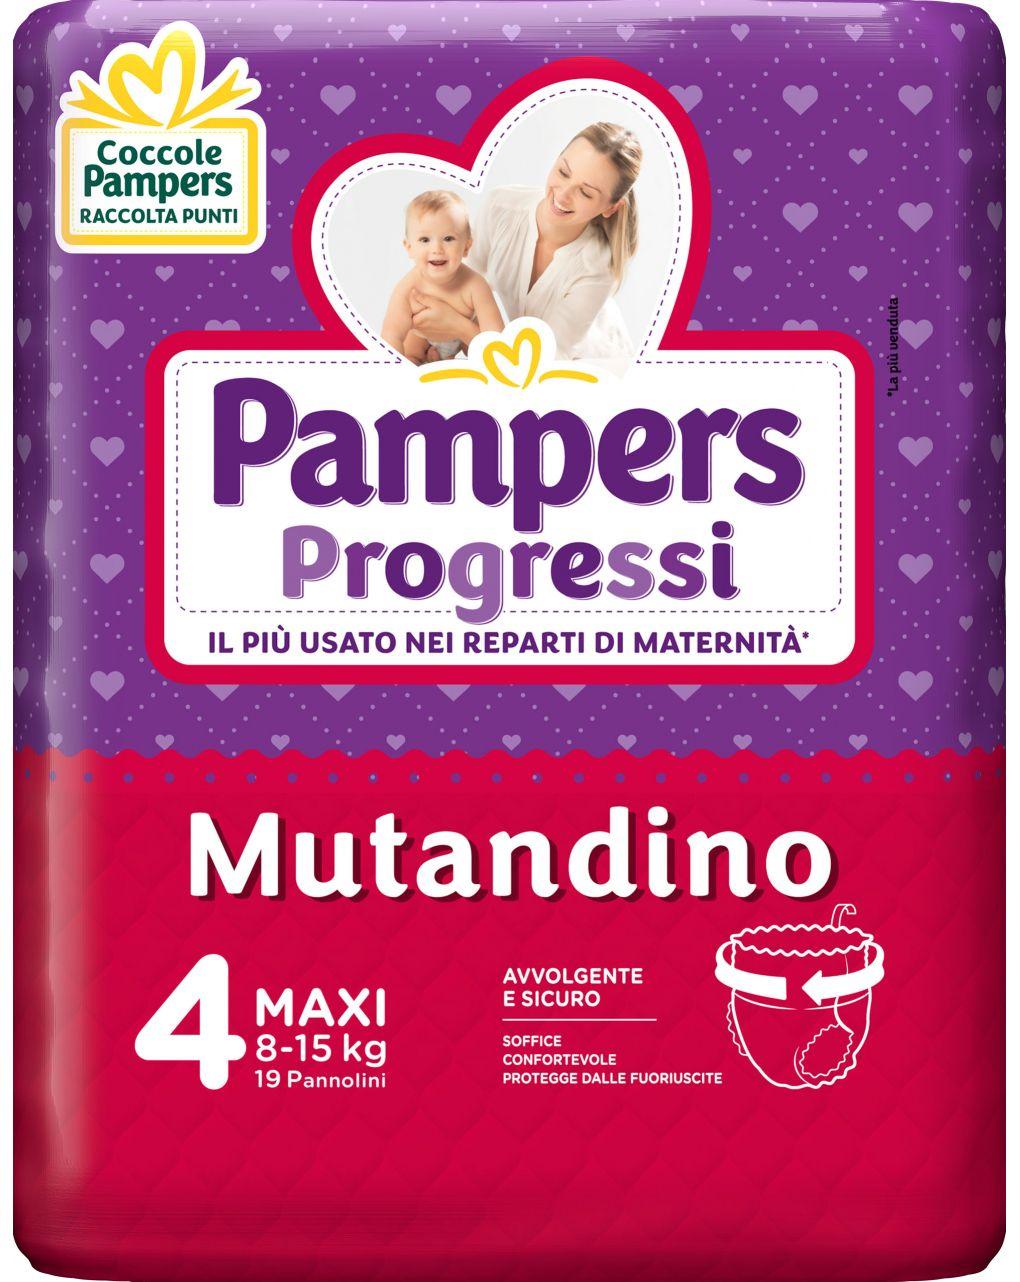 Pampers - pannolino progressi mutandino tg. 4 (19 pz) - Pampers